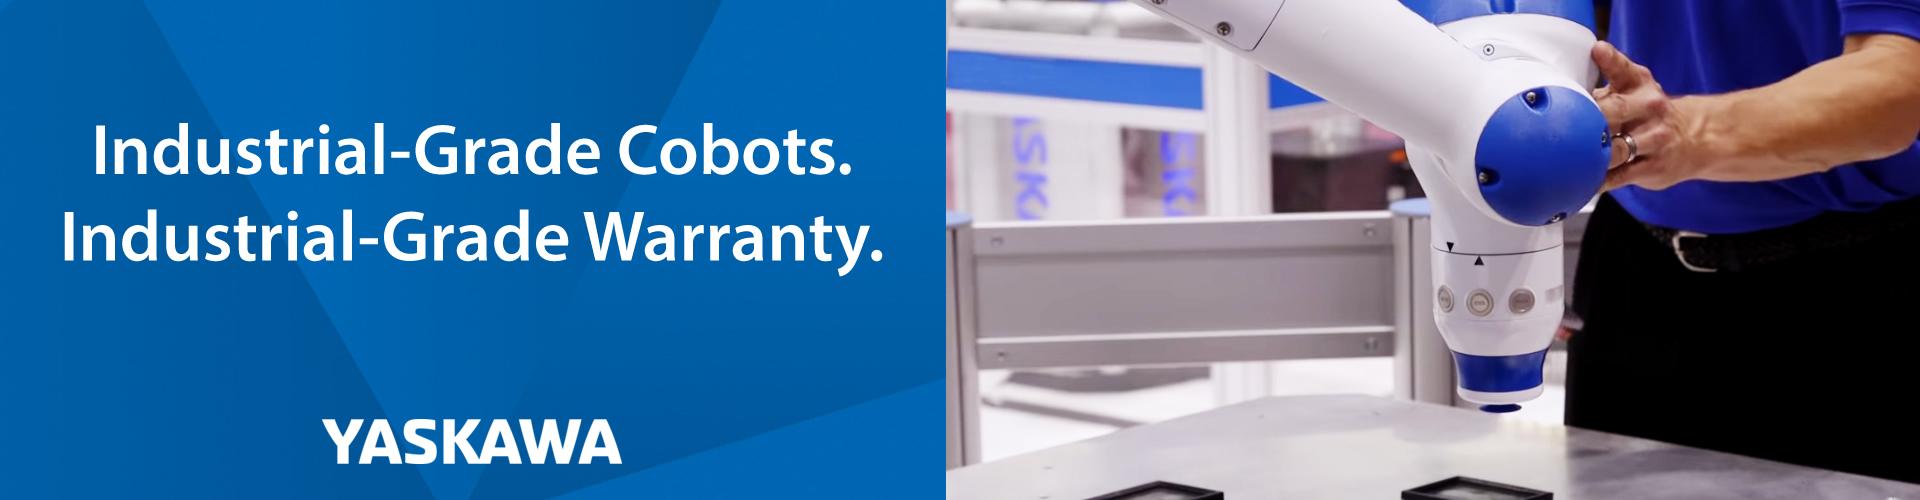 HC10DT cobot - 2-year warranty offer